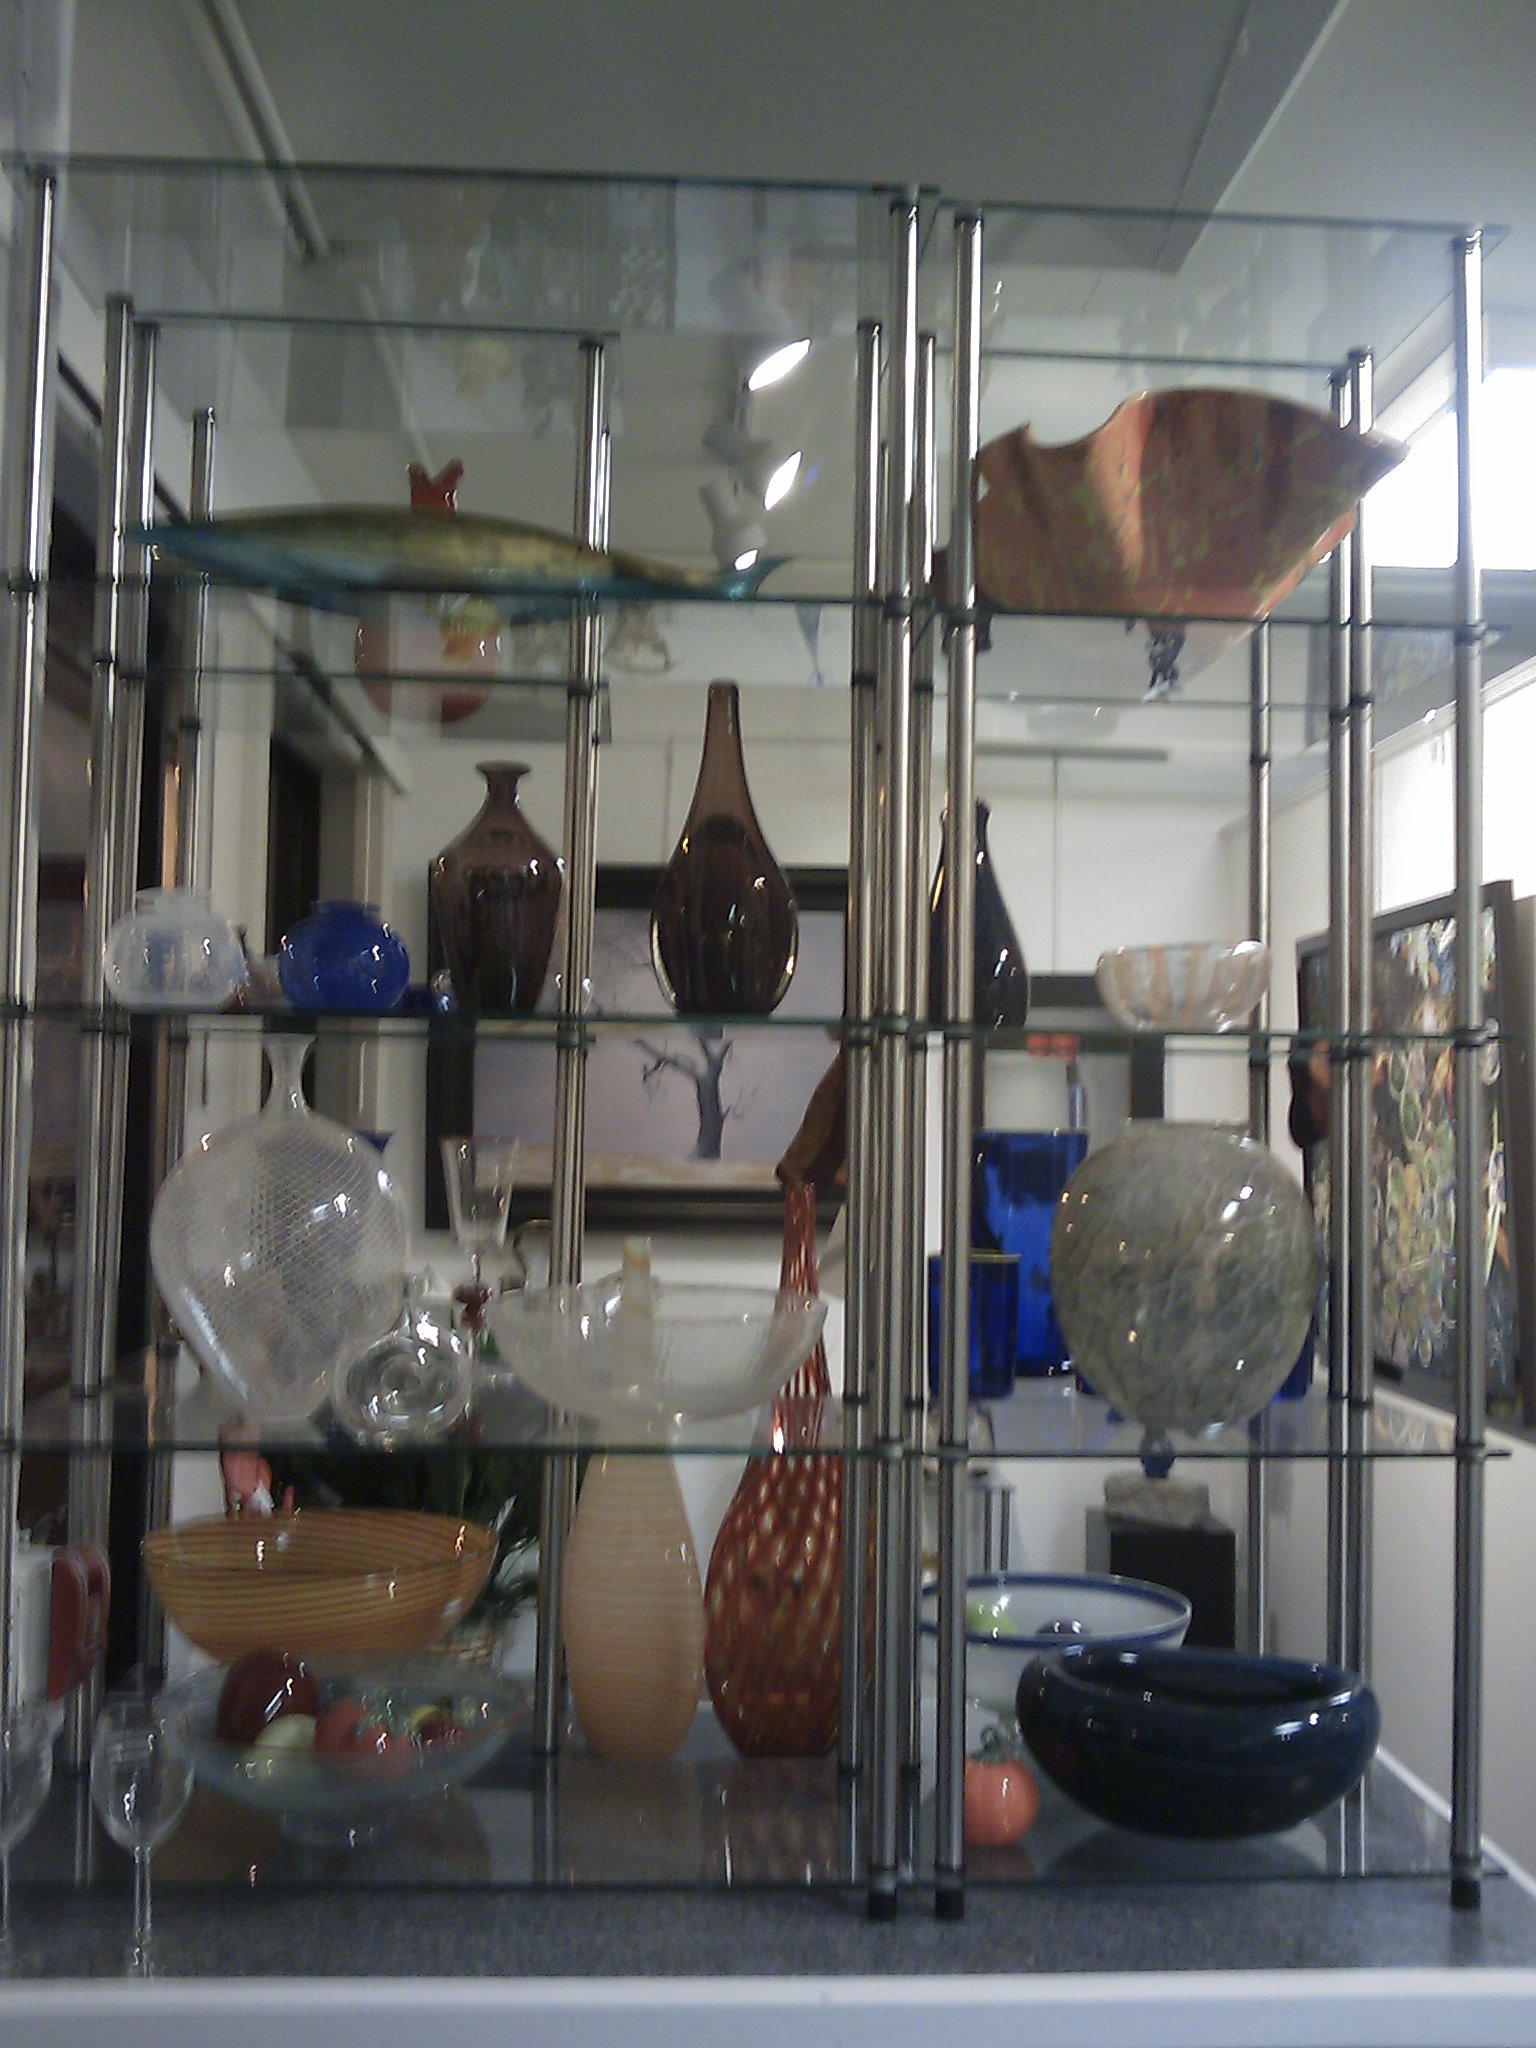 Glass and Ceramics on Display